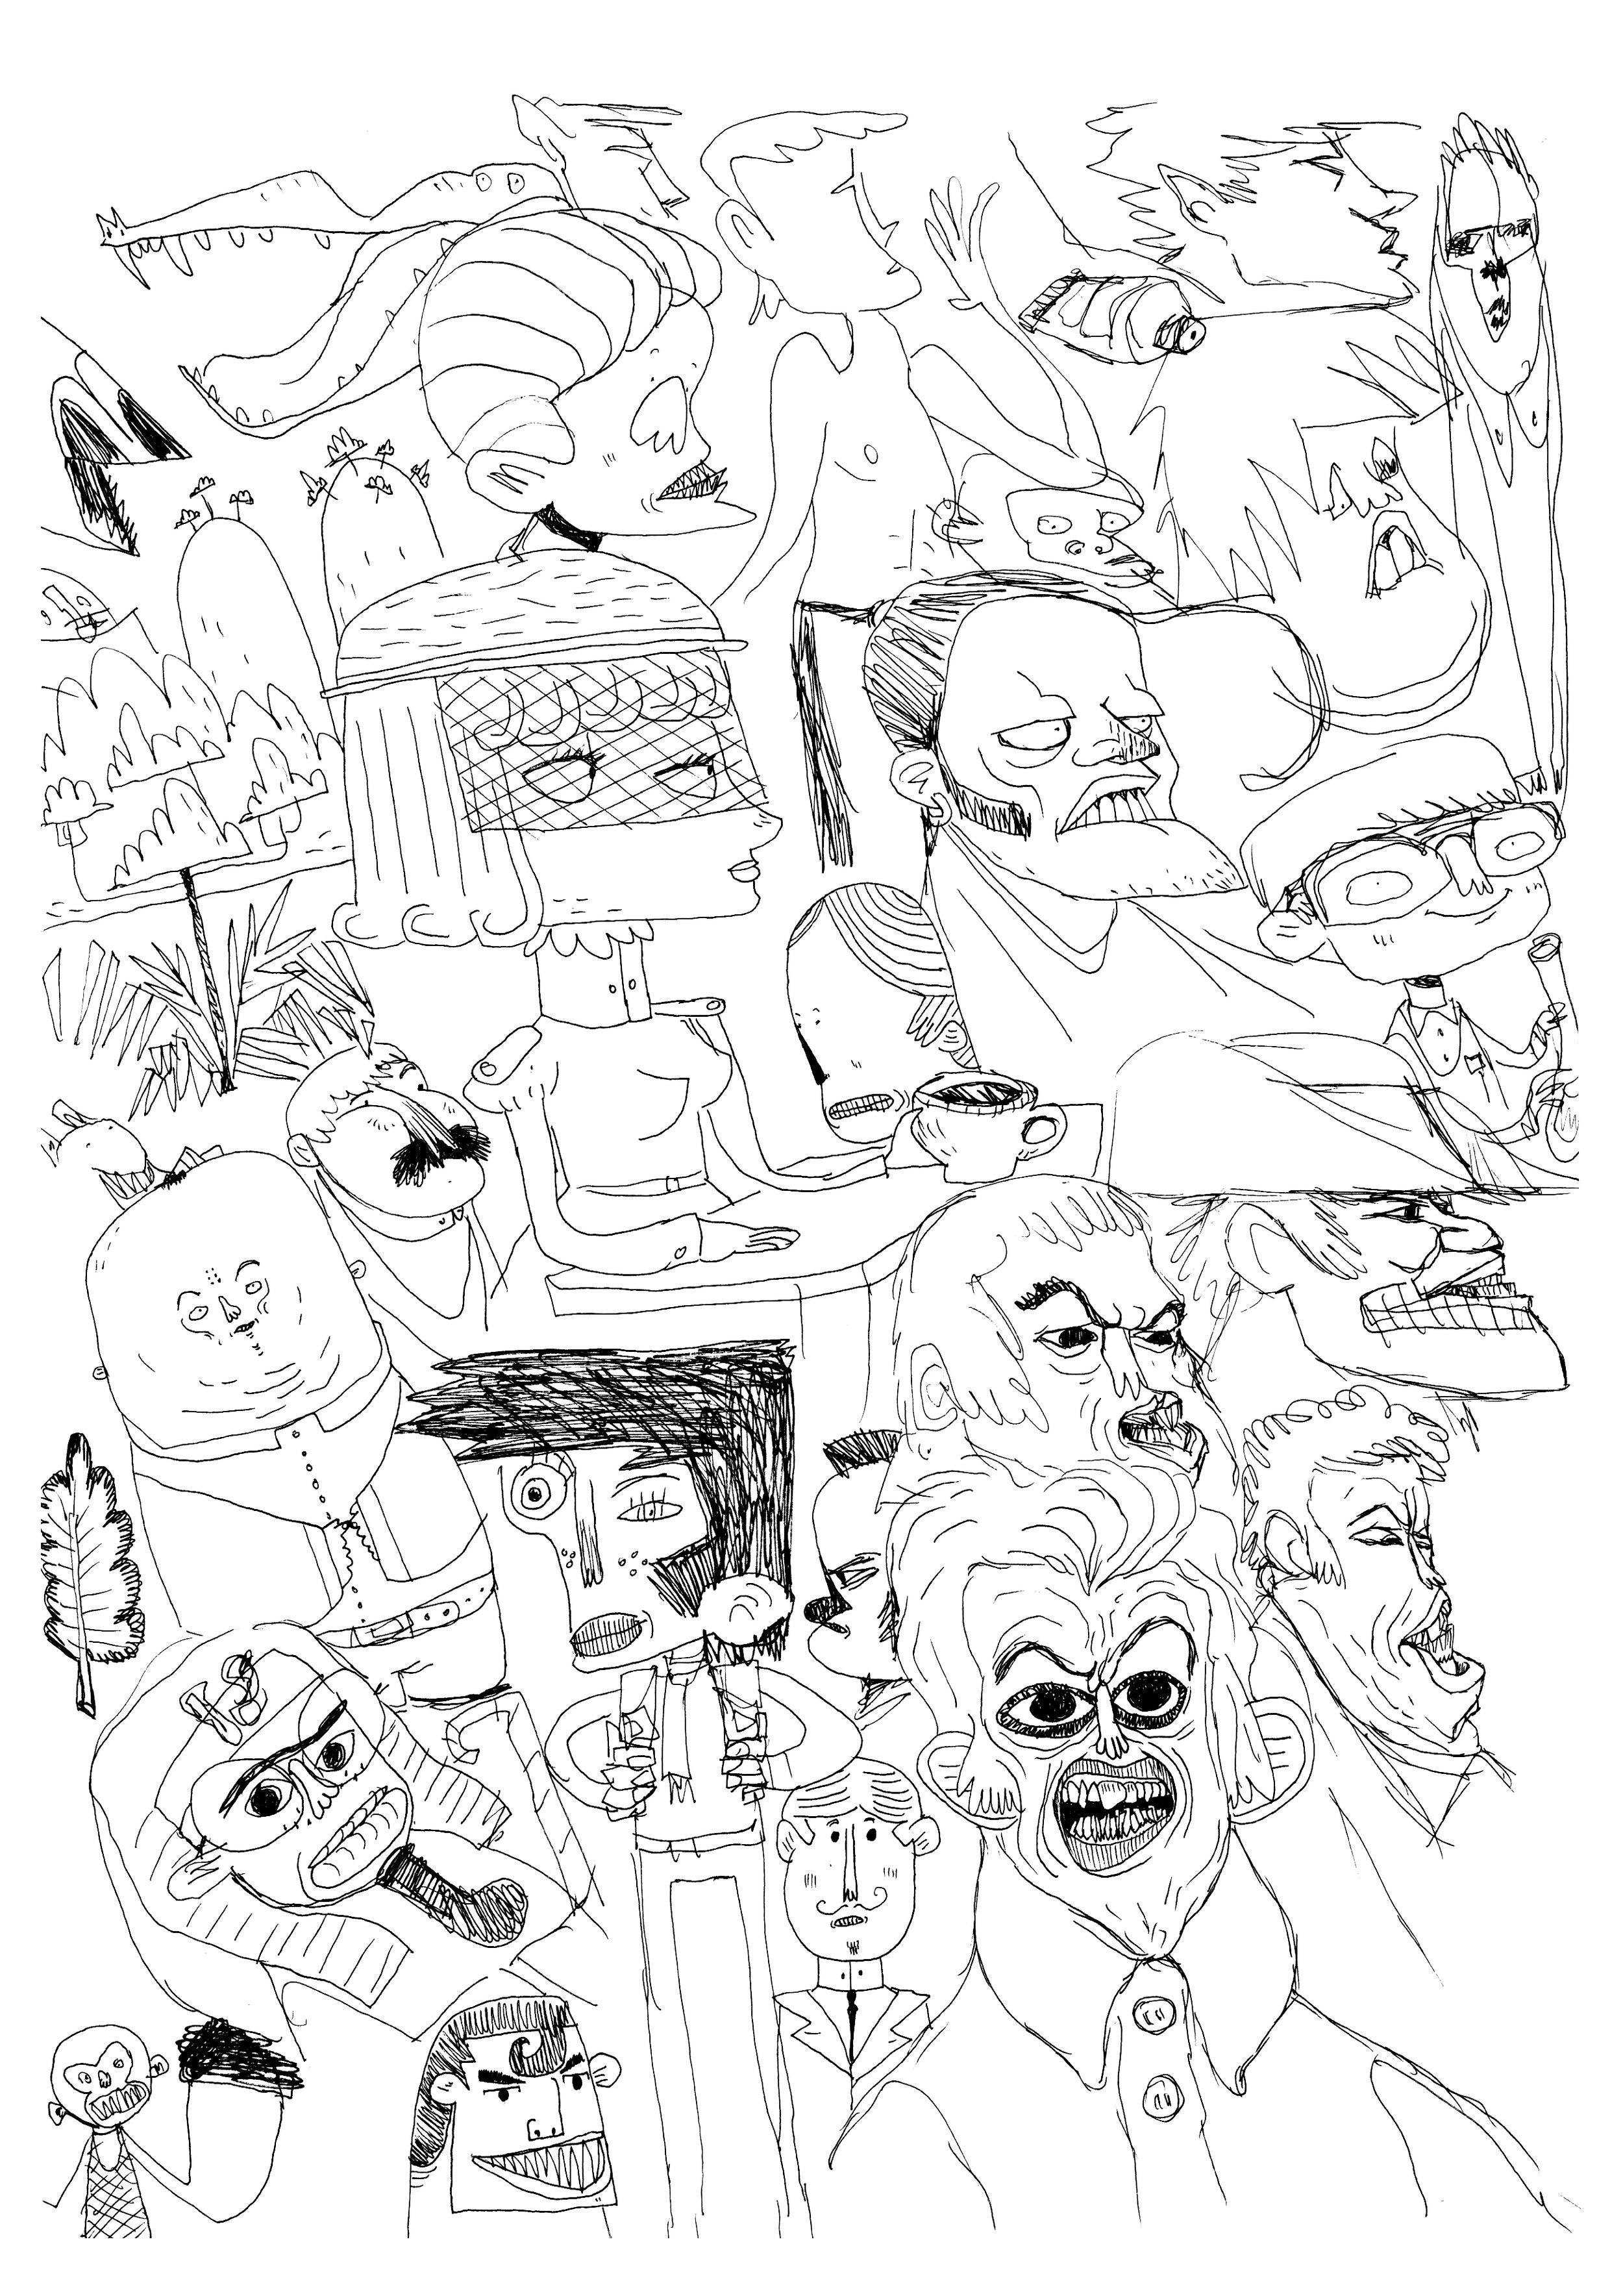 Pascal_Zaffiro_Doodle_21.jpg